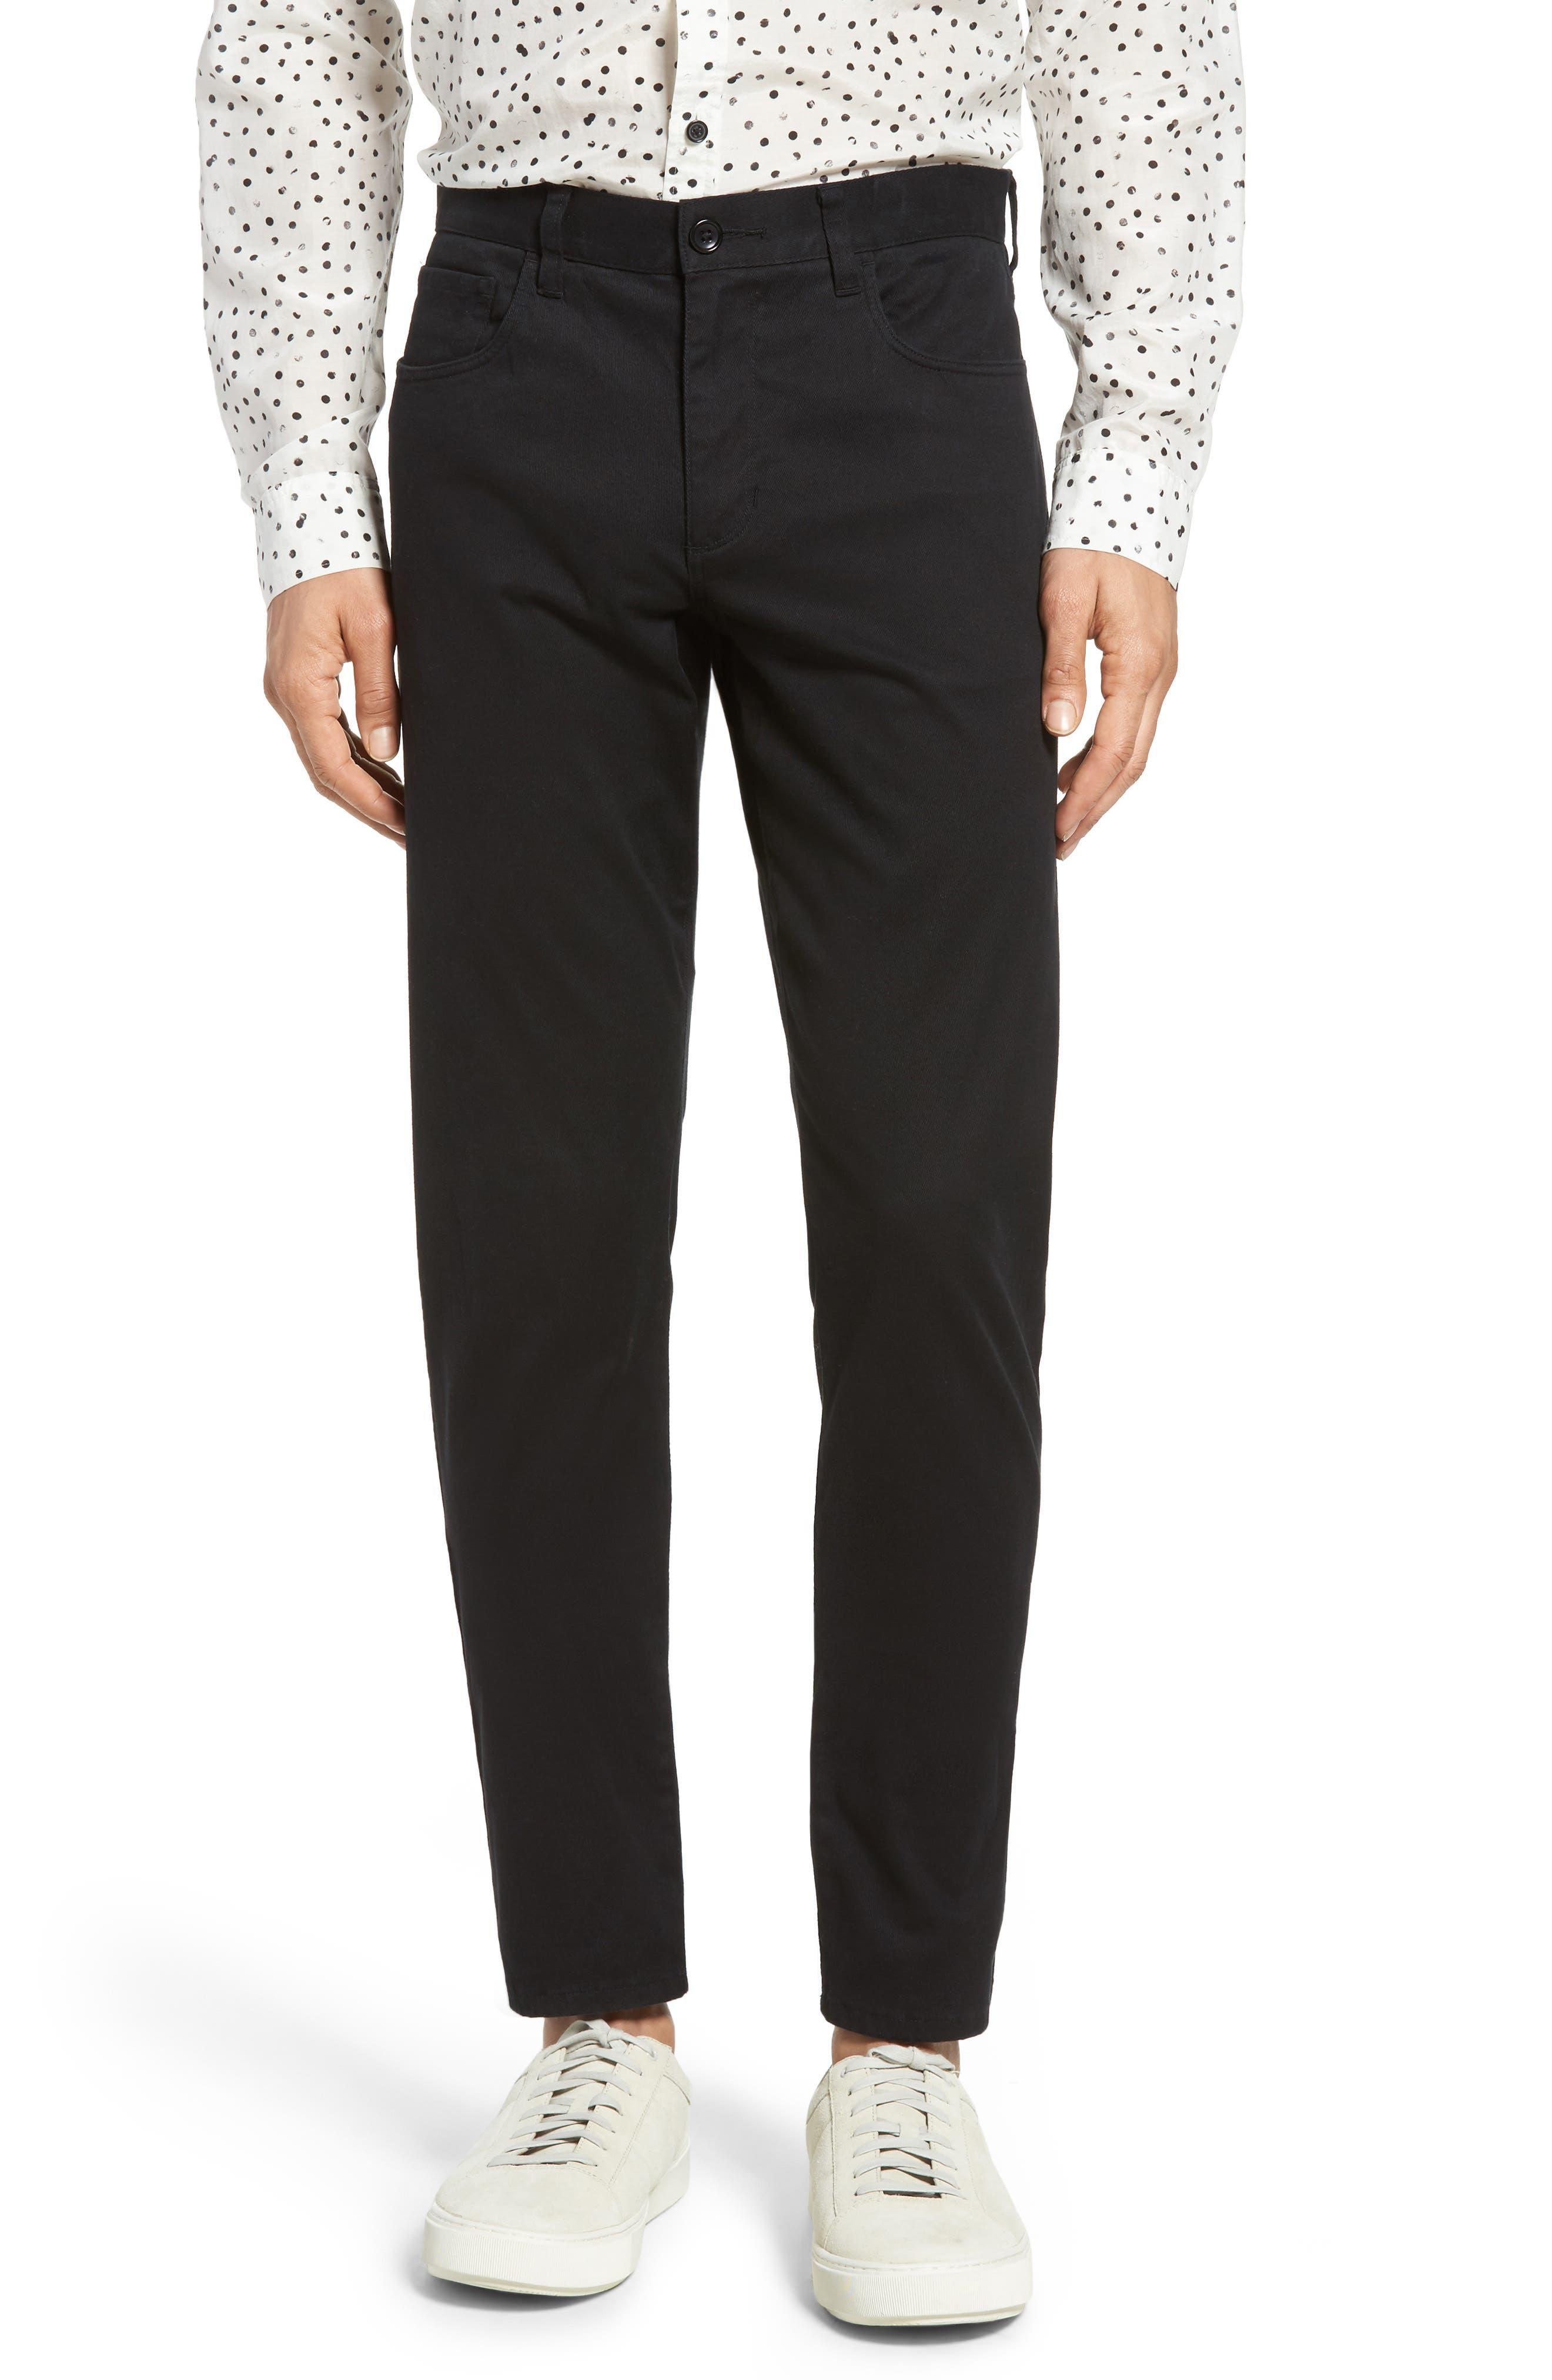 VINCE Soho Slim Fit Five-Pocket Pants, Main, color, 001